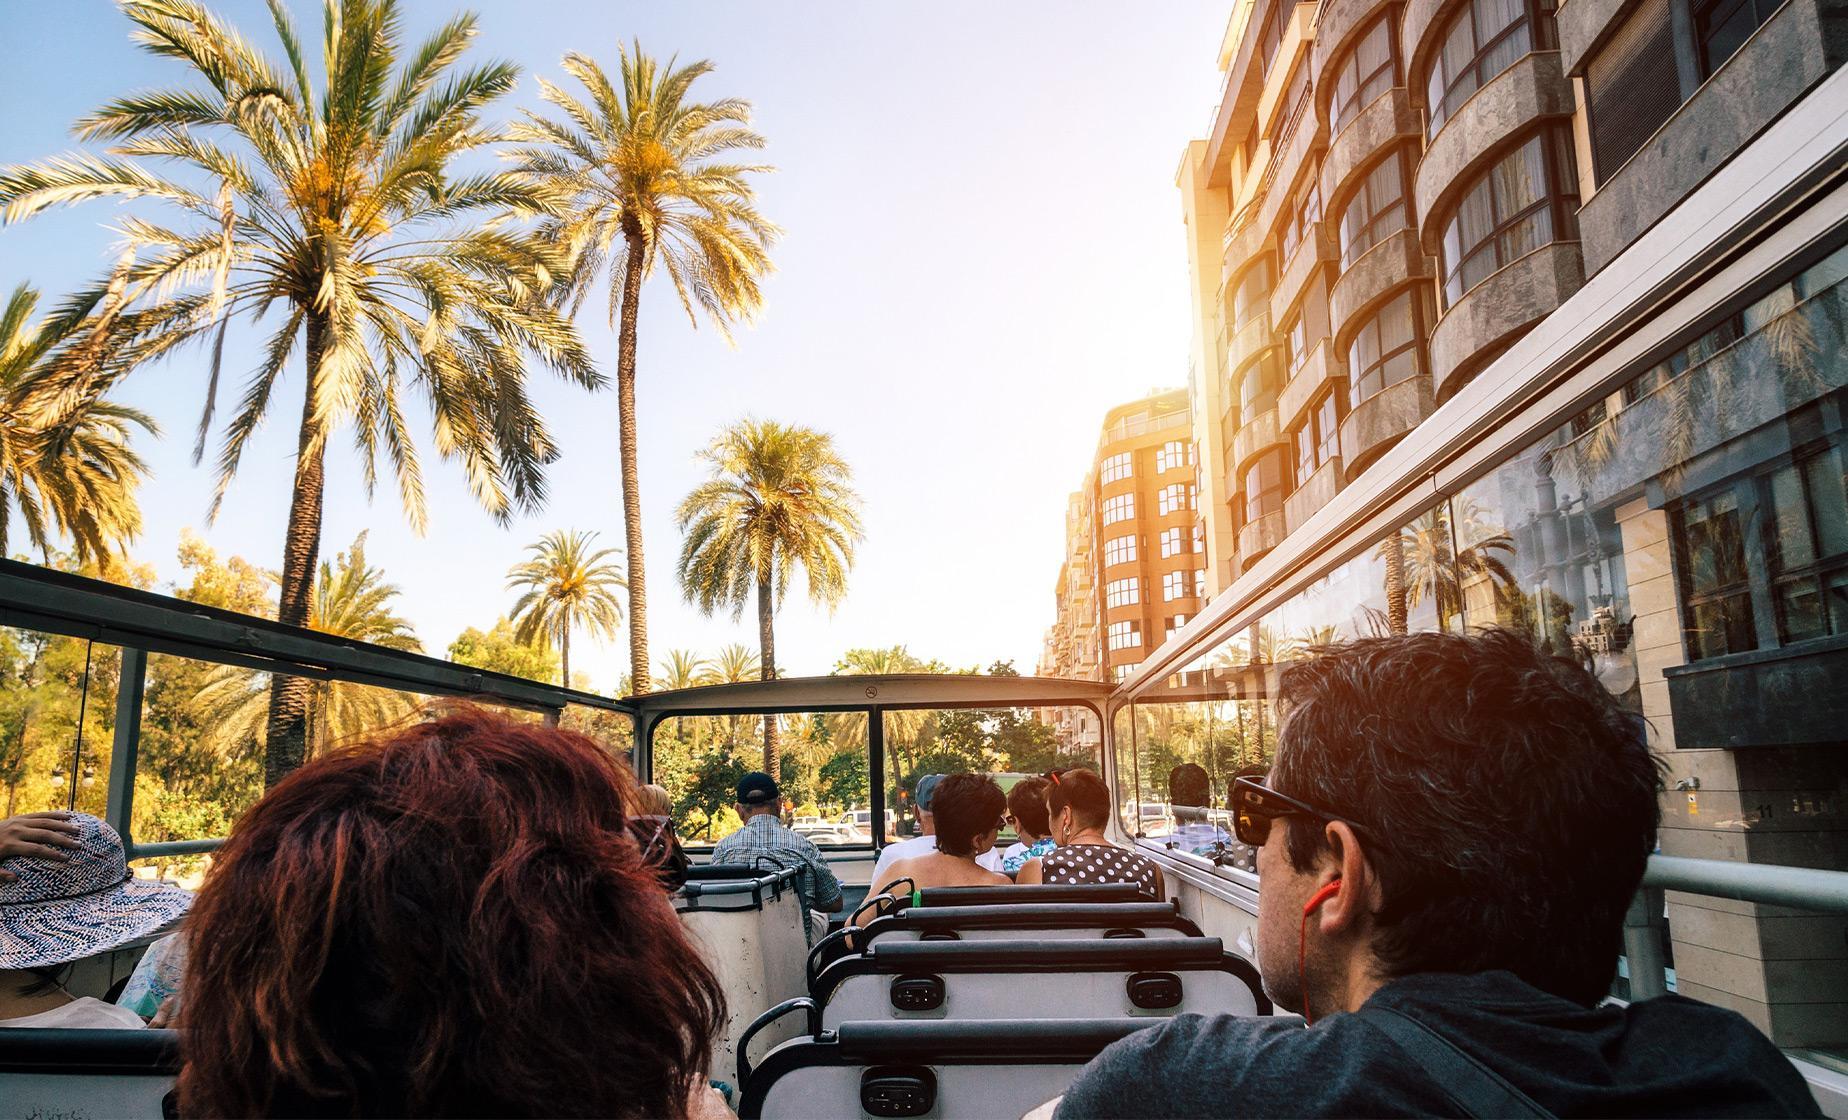 Cartagena, Colombia Cruise Port